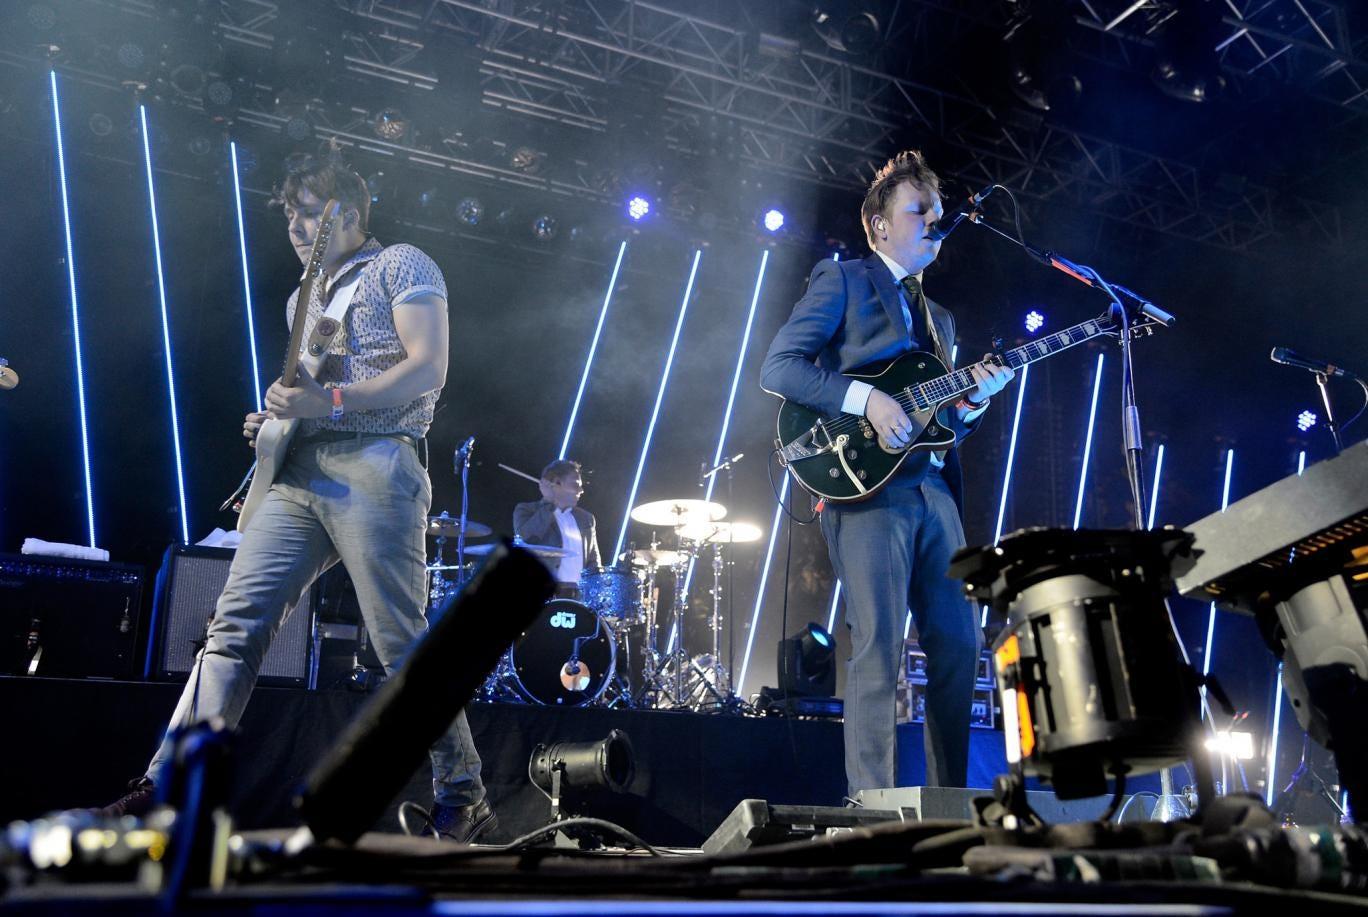 Northern Irish trio Two Door Cinema Club will play Latitude Festival next summer